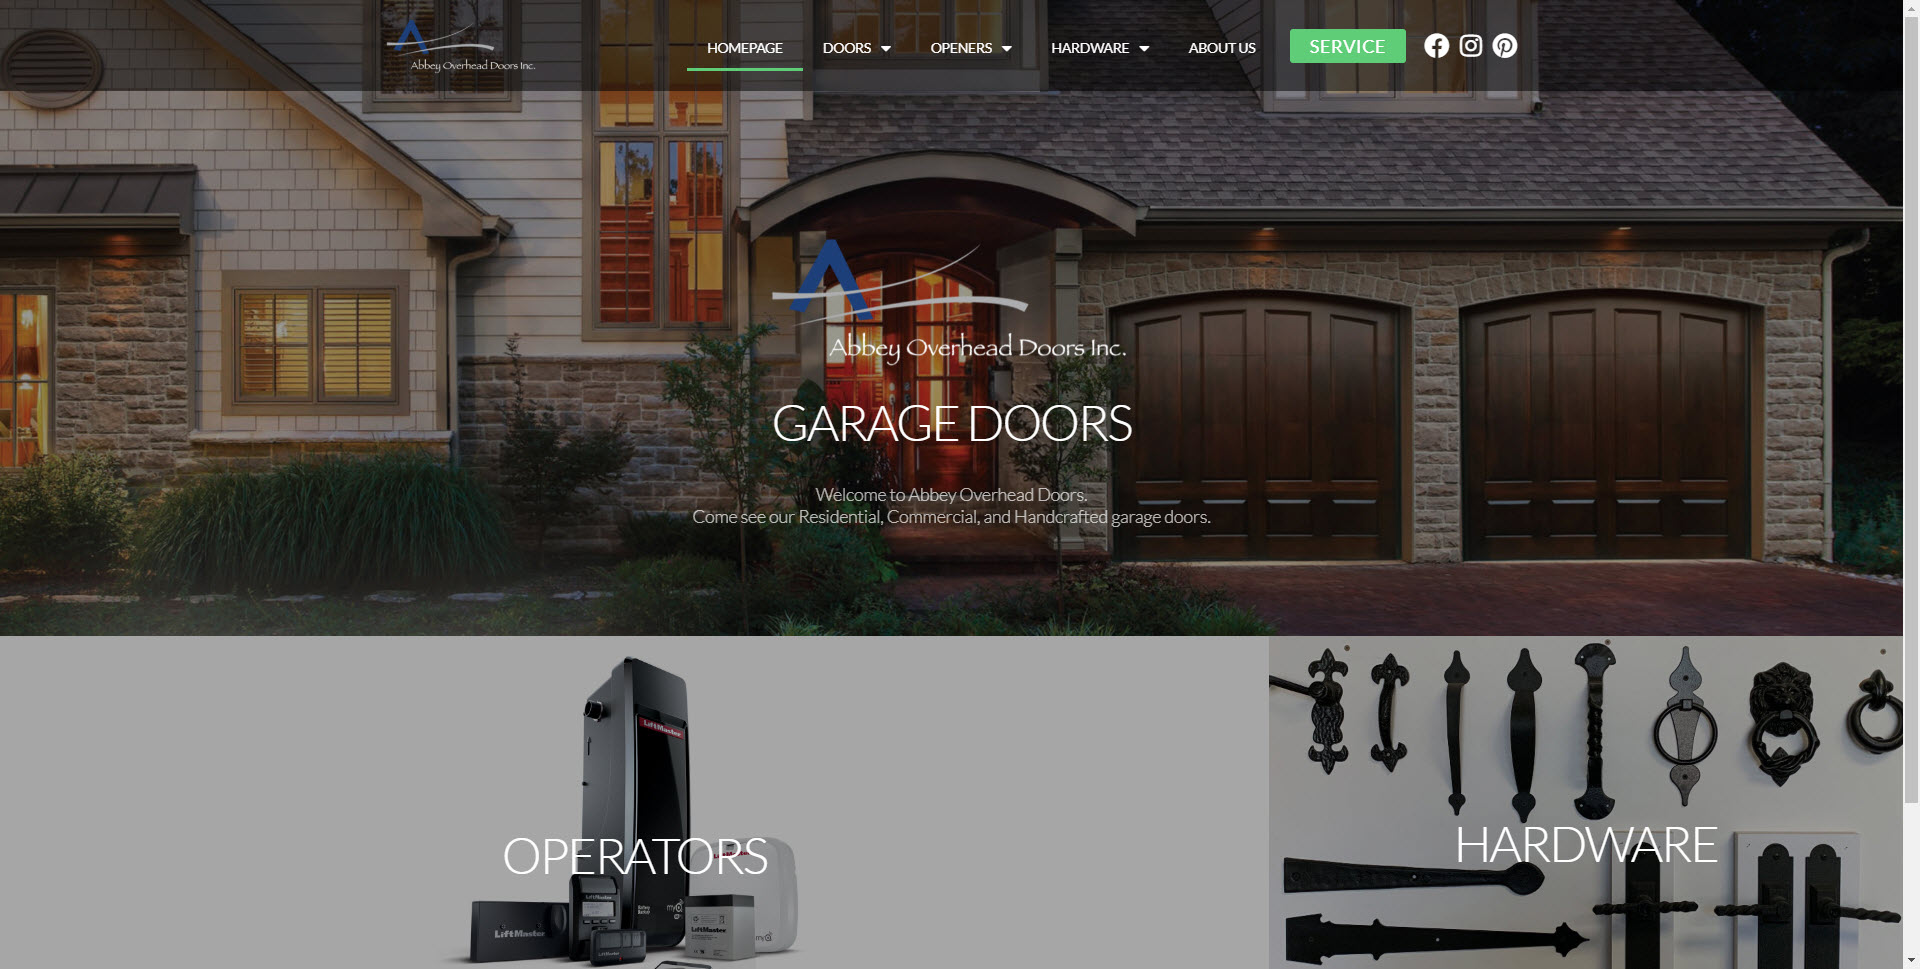 abbeyoverheaddoors_websiteredesign_home